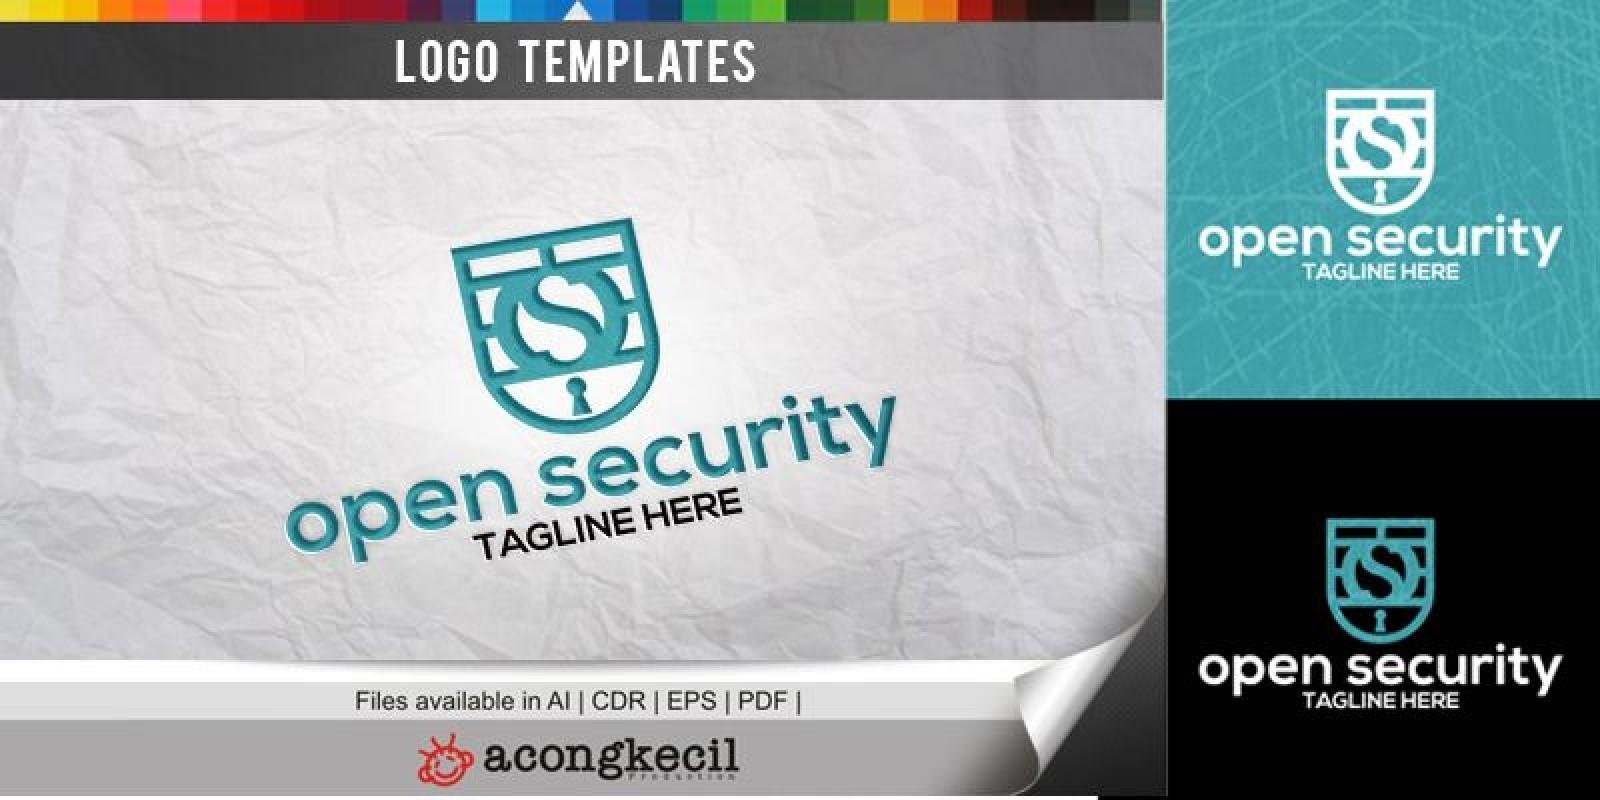 Open Security - Logo Template